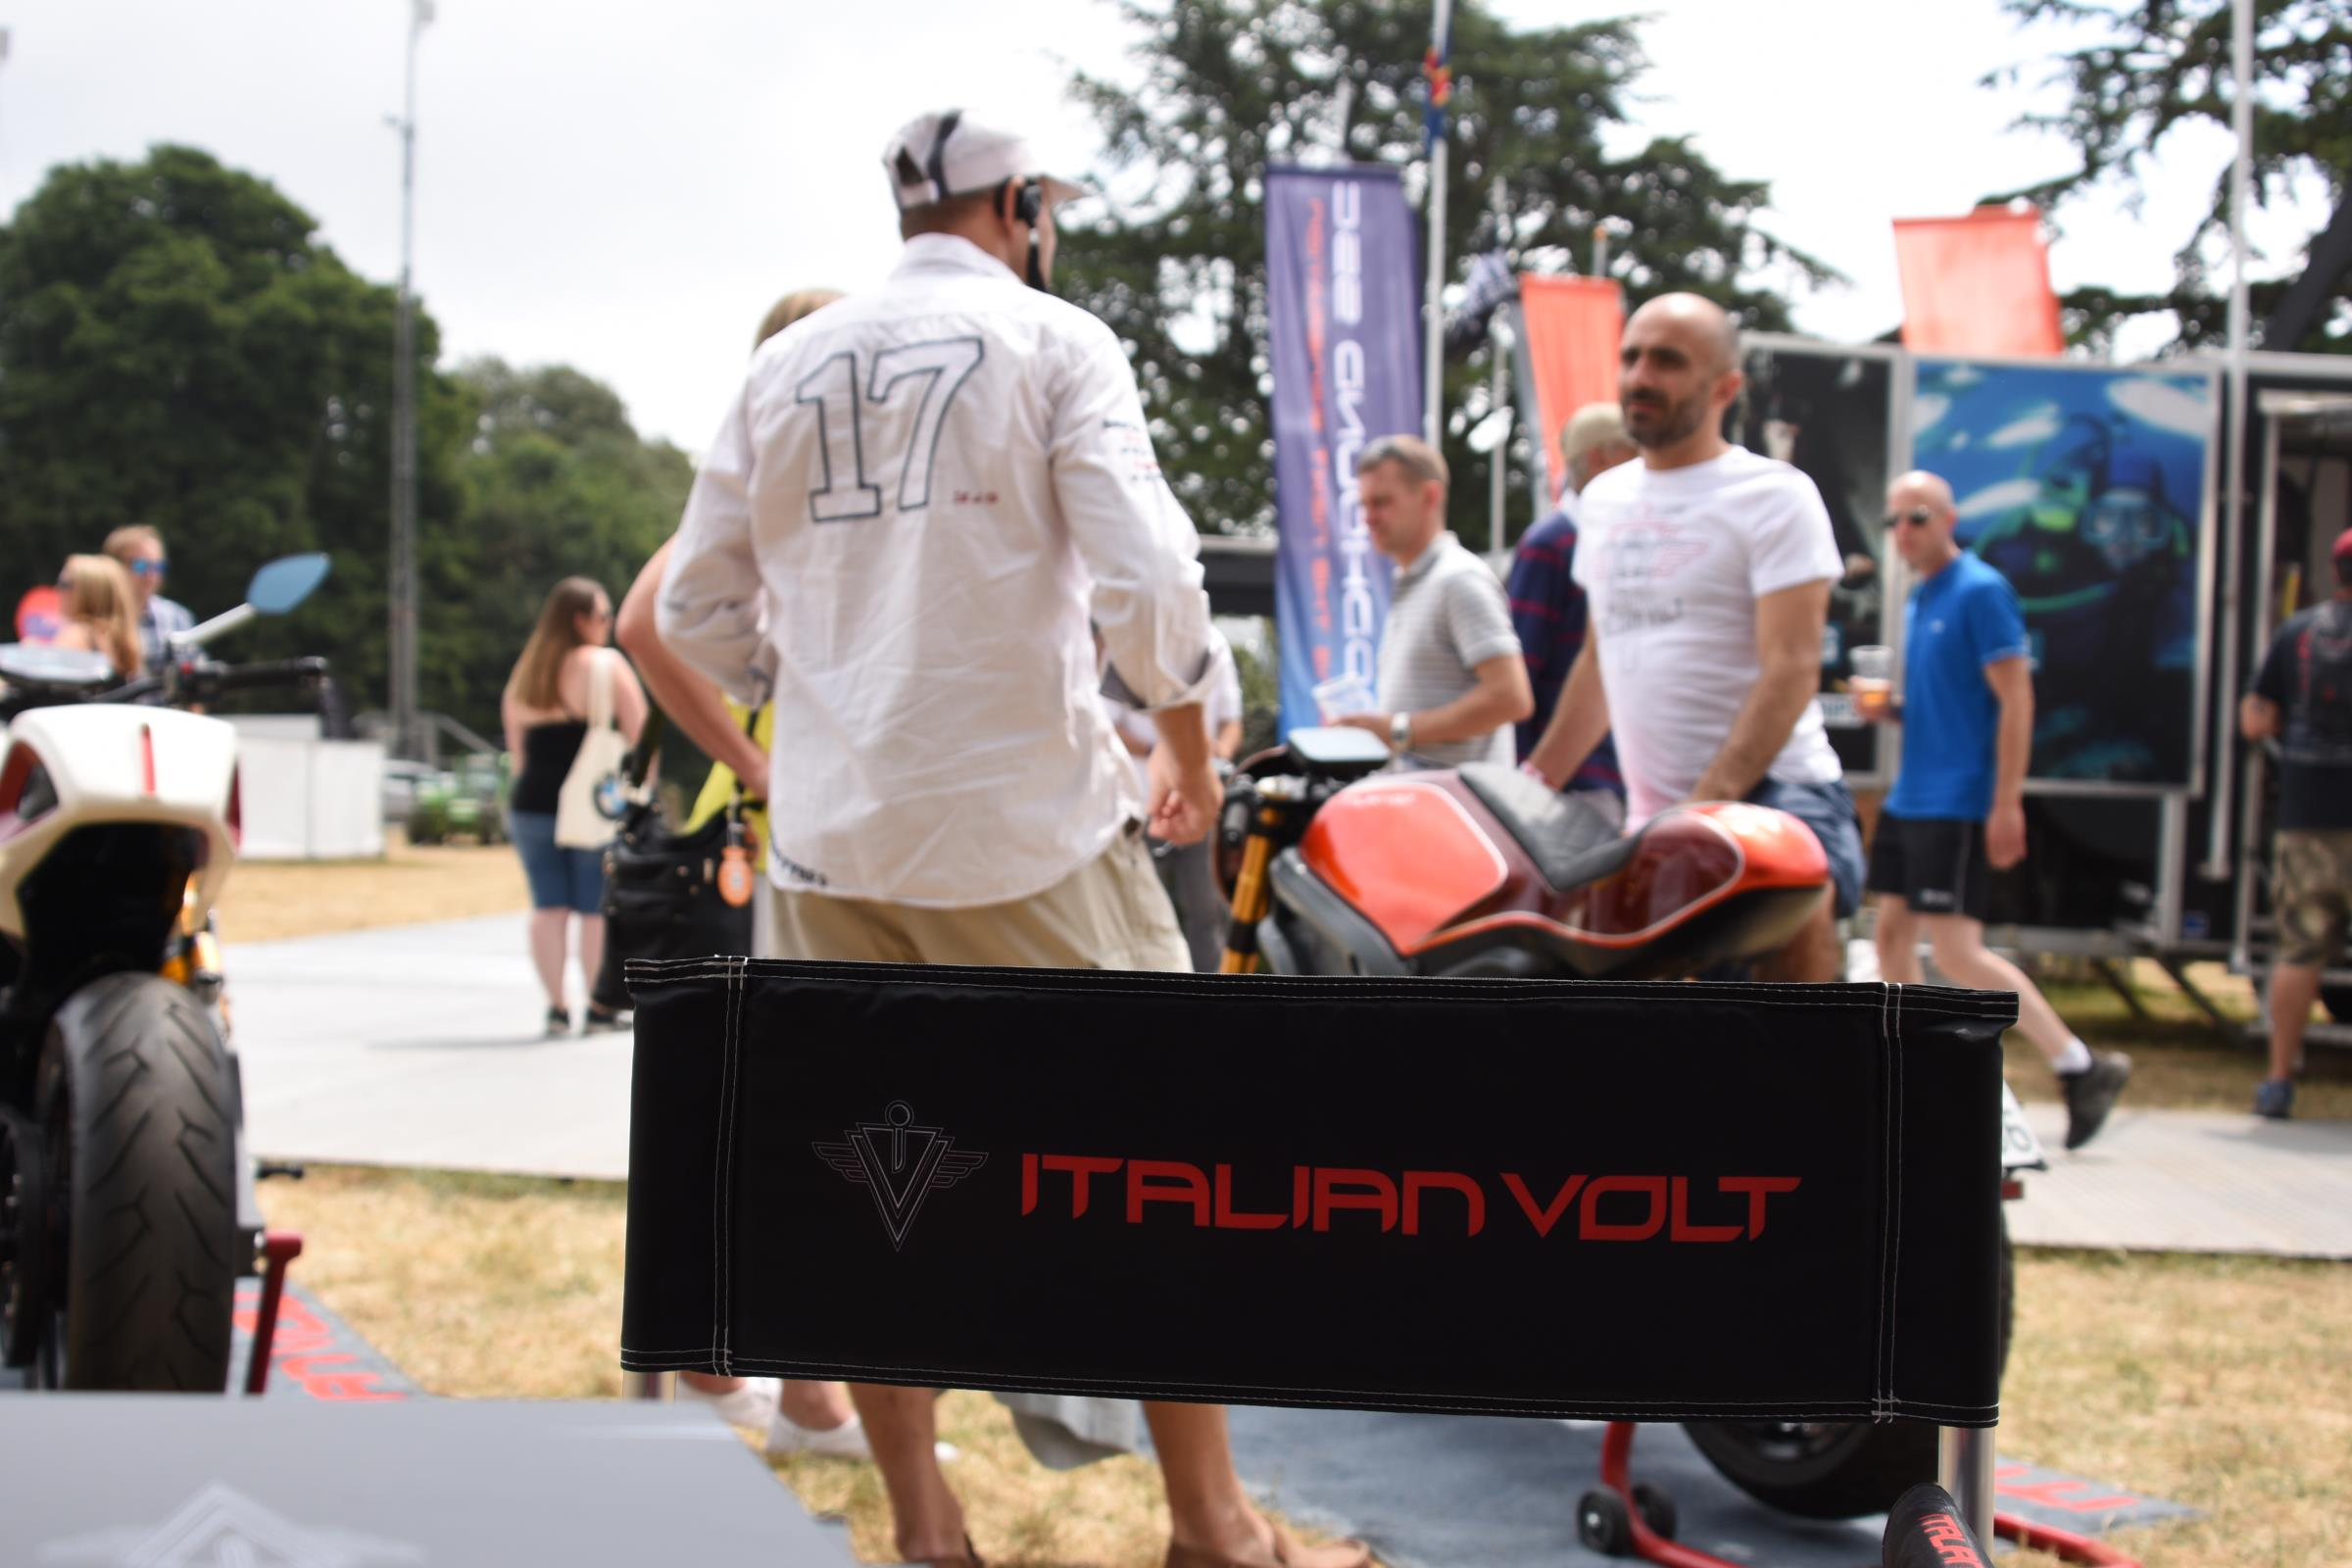 italian_volt_electric_motor_news_31